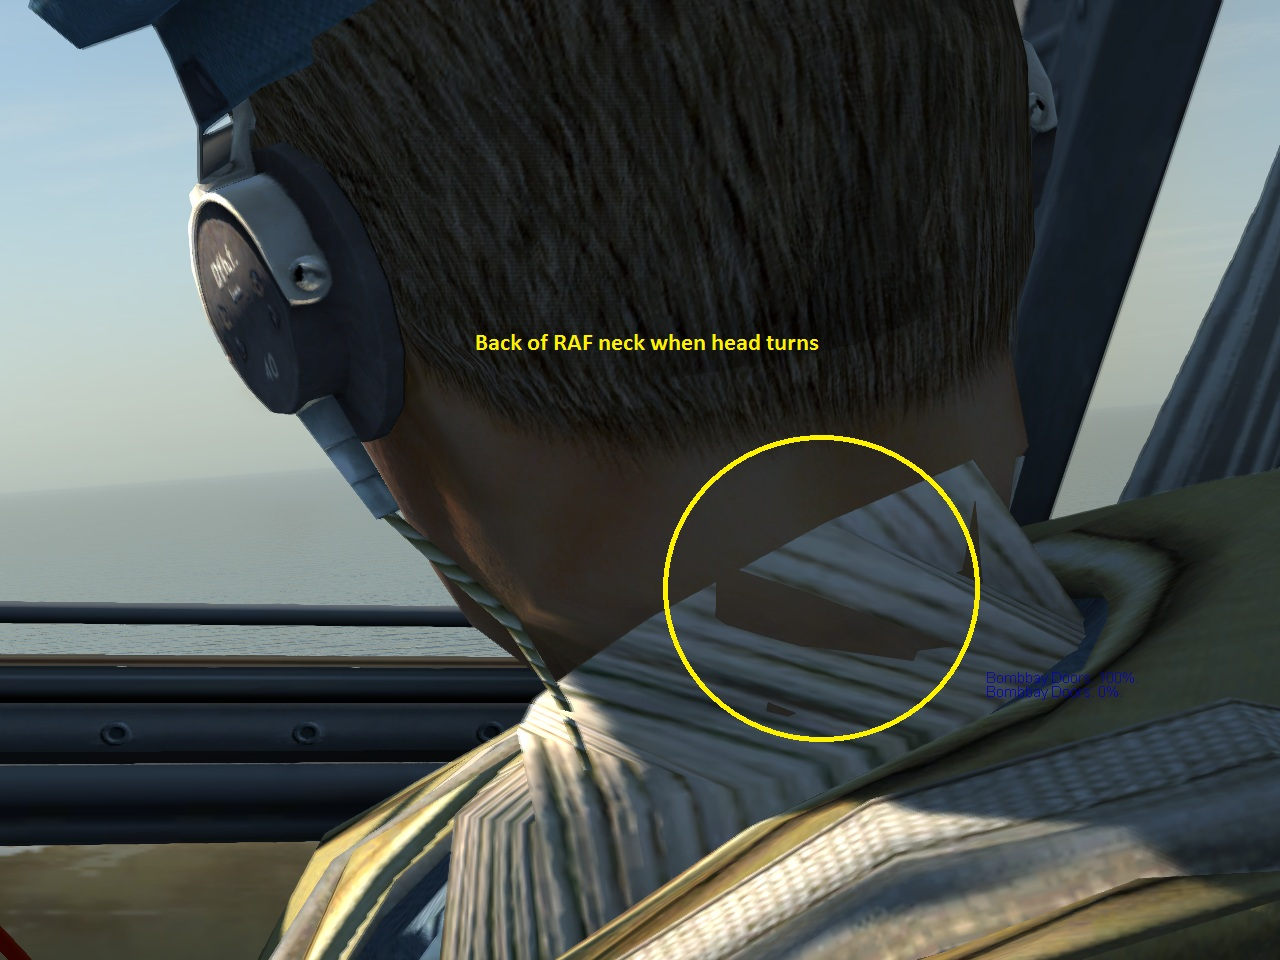 RAF neck